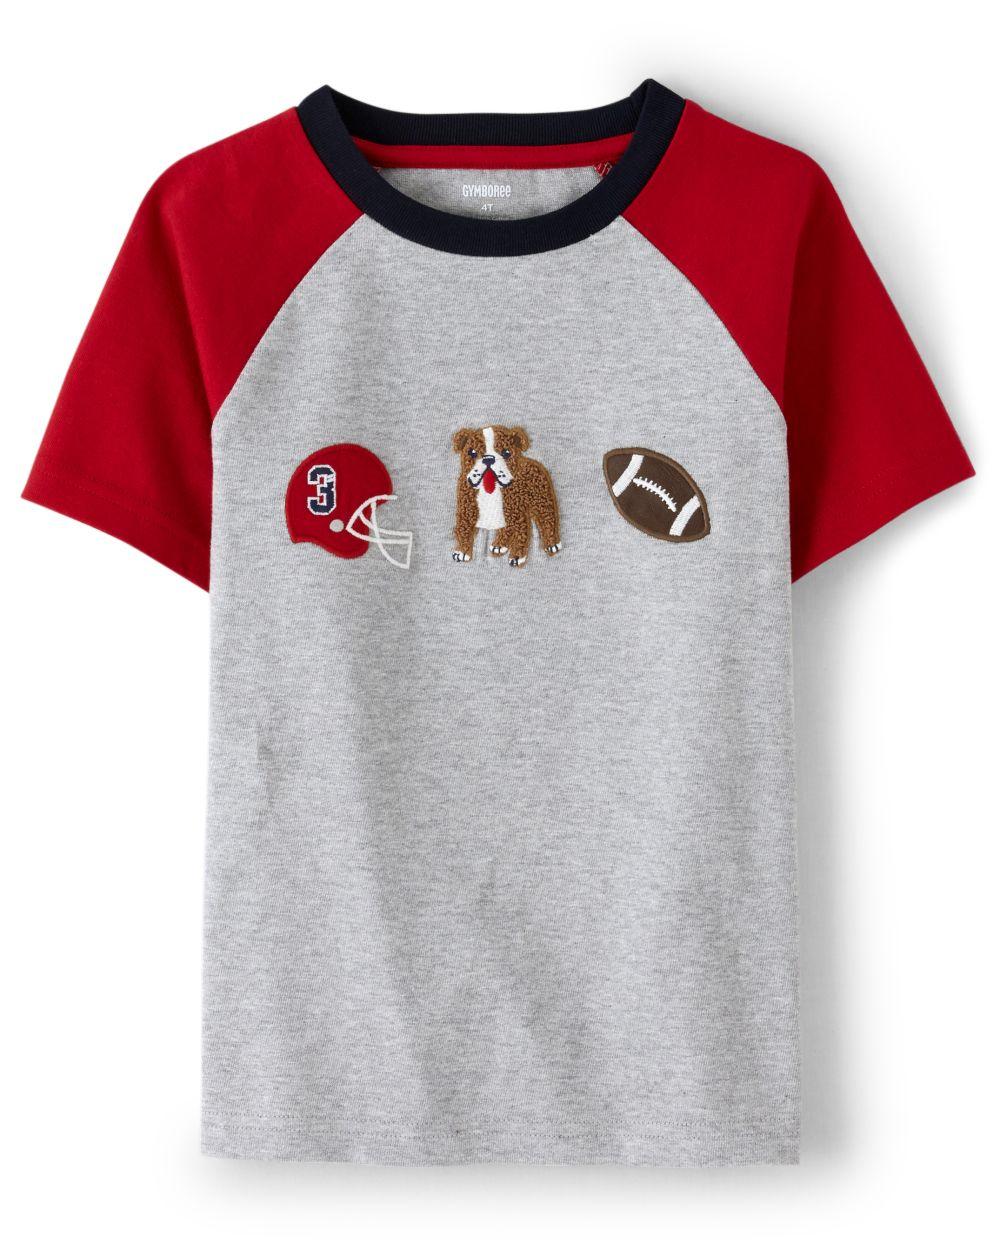 Boys Football Dog Top - Preppy Puppy